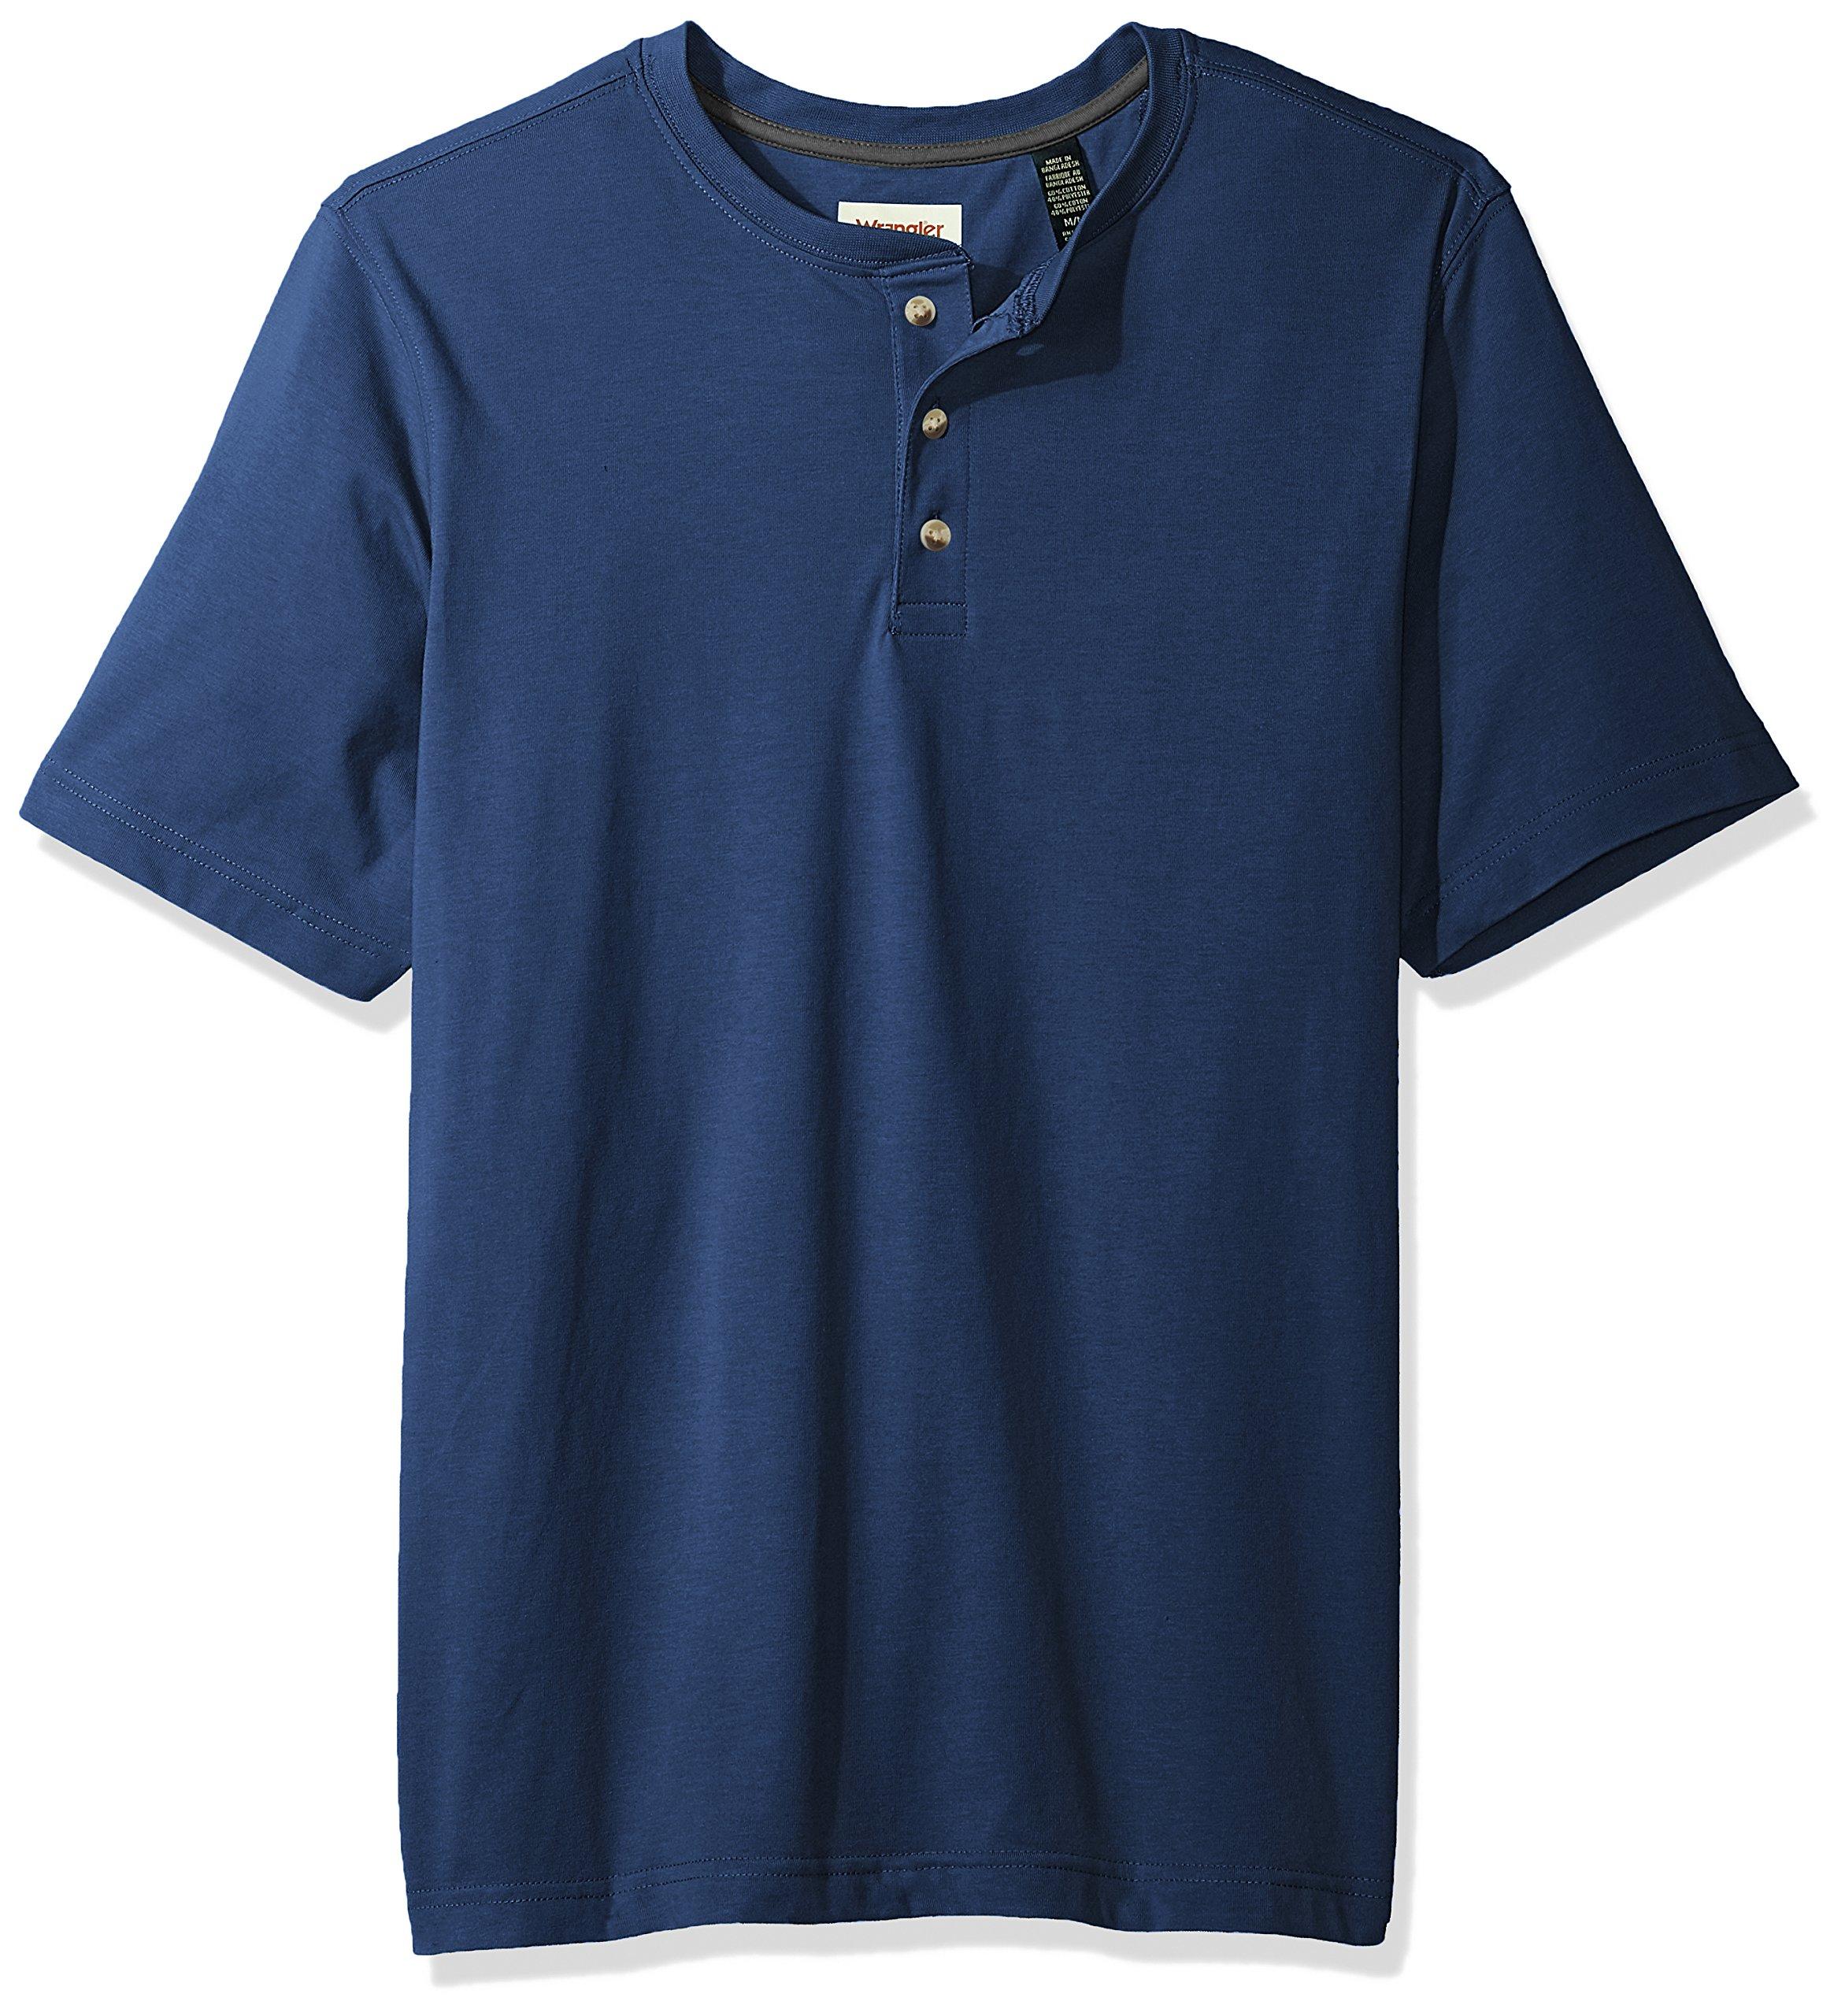 Wrangler Authentics Men's Big & Tall Short Sleeve Henley Tee, Dark Denim, XL by Wrangler